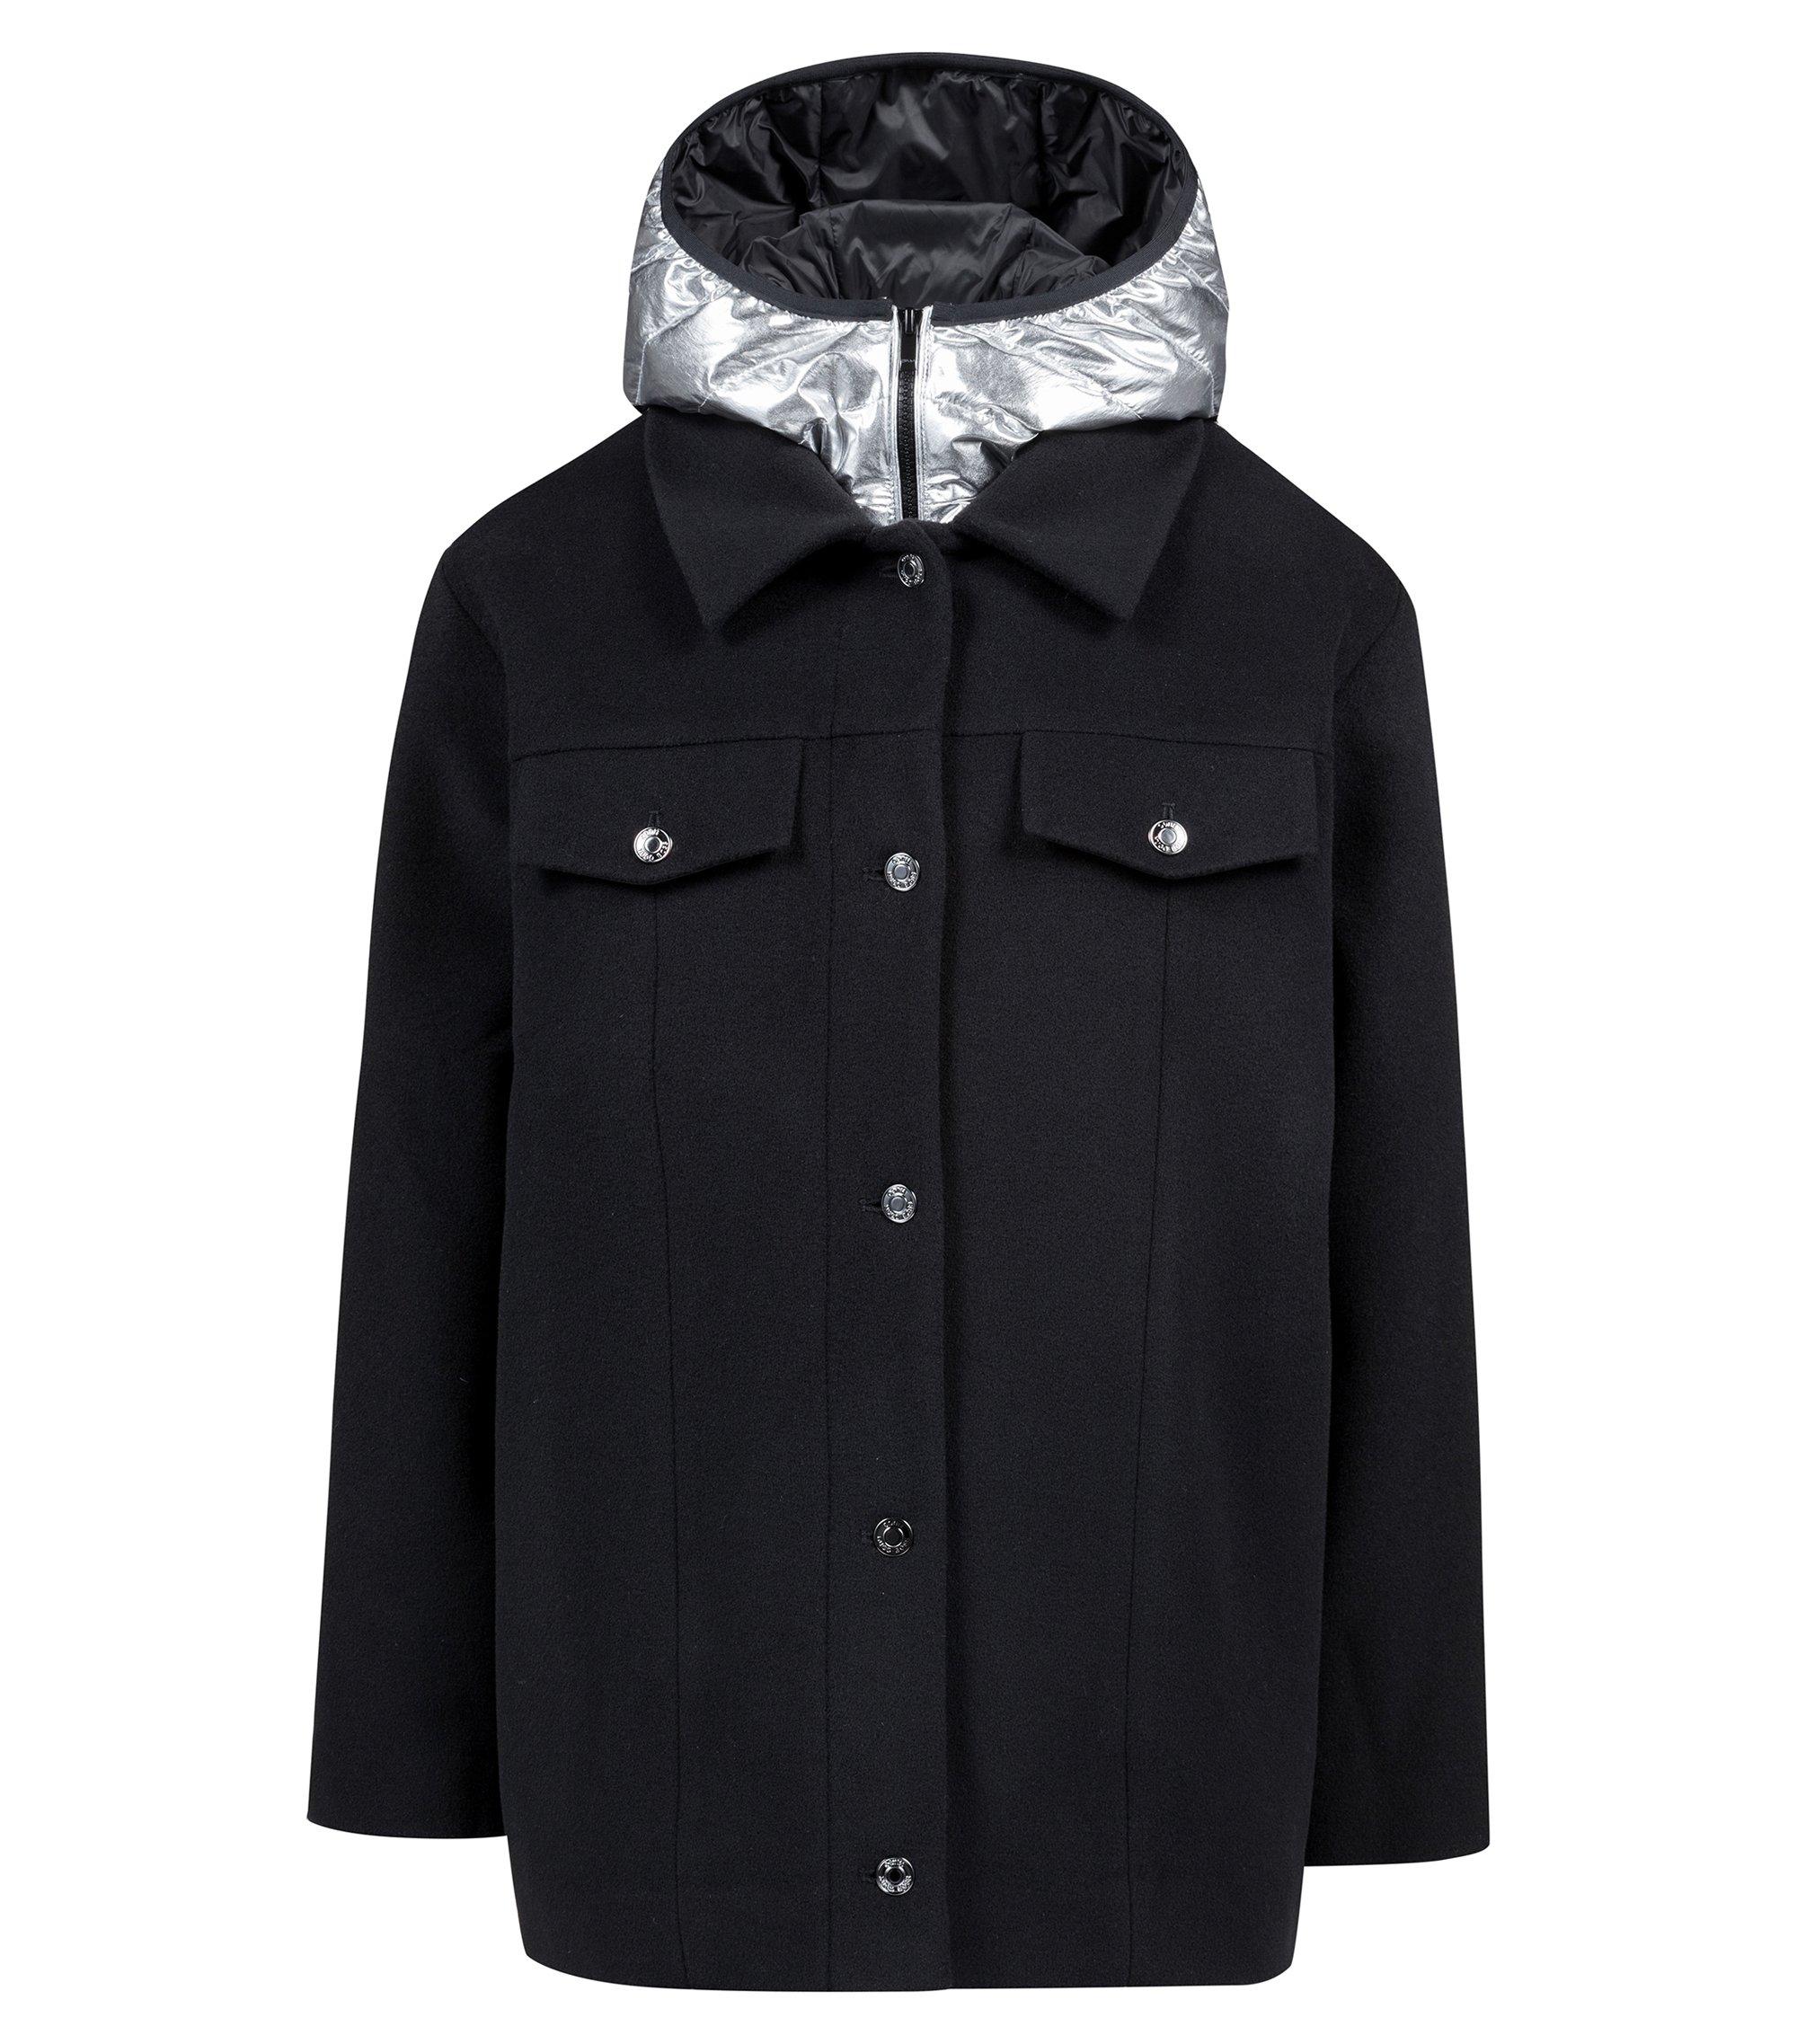 Wool-blend jacket with detachable metallic down-filled gilet, Black